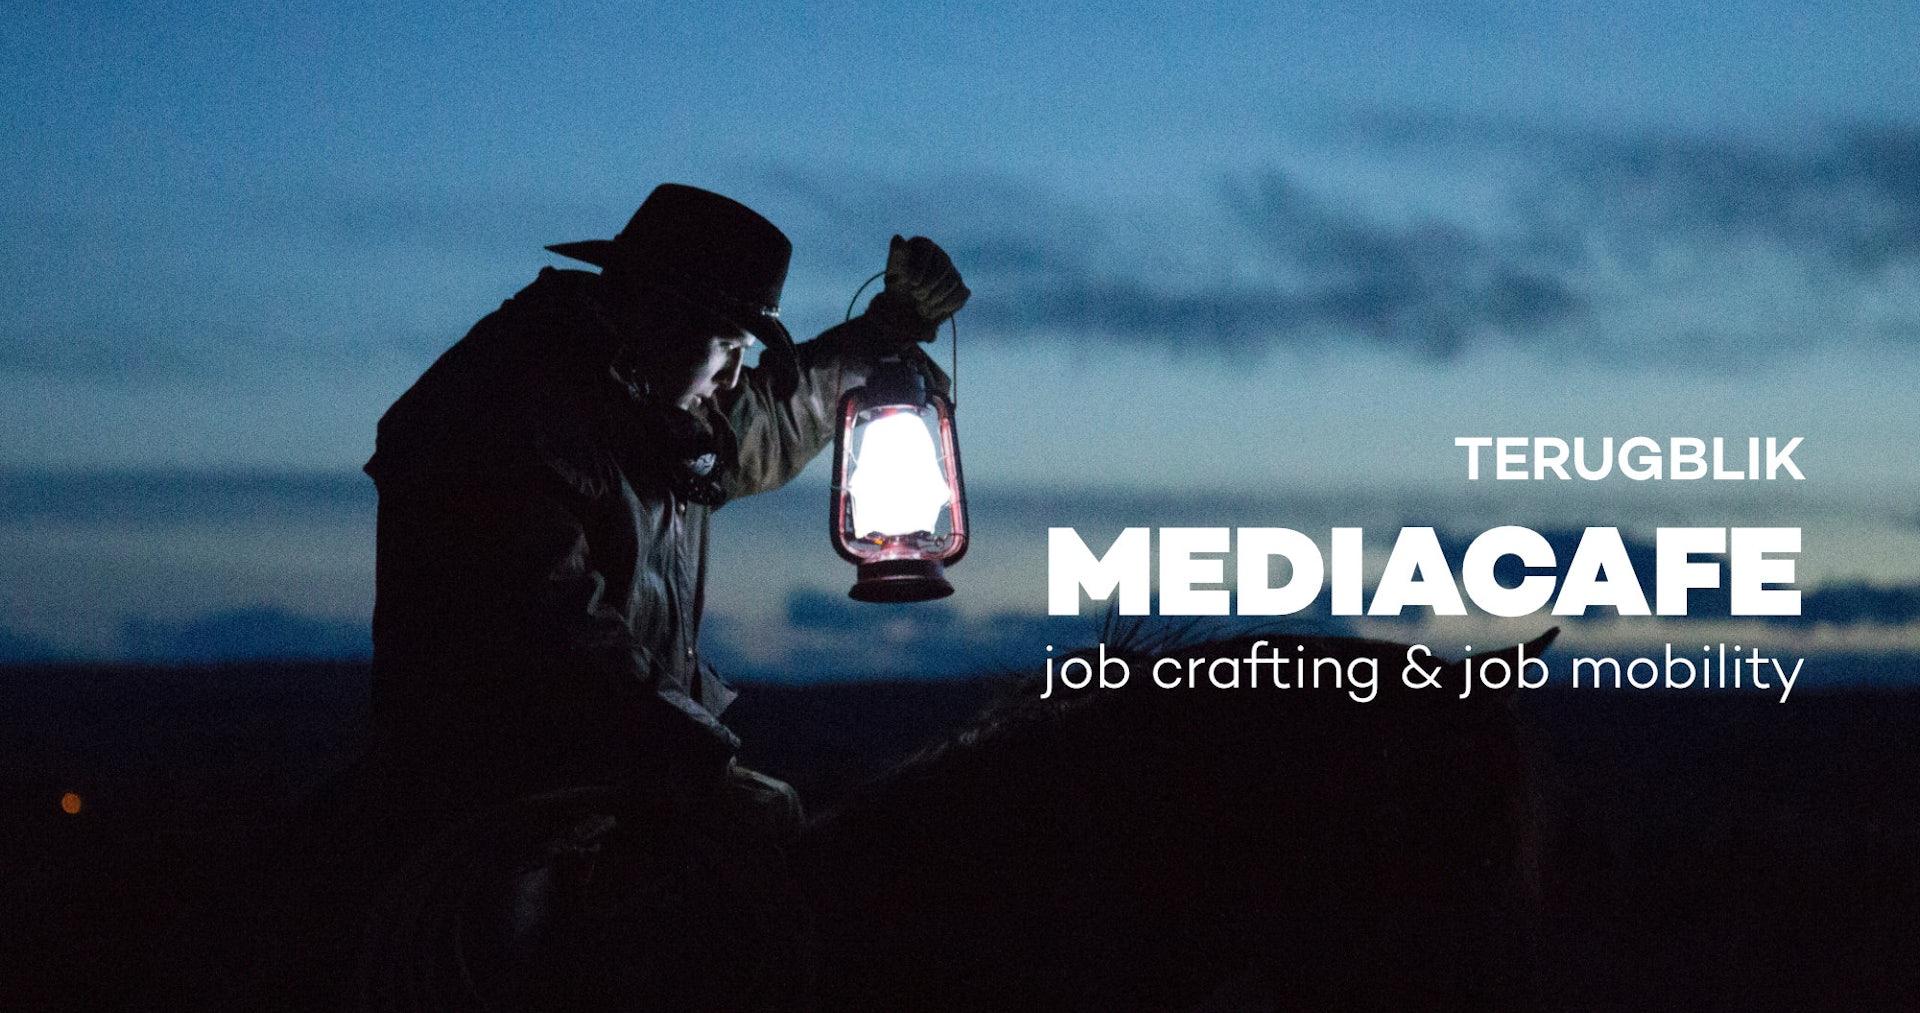 terugblik mediacafé